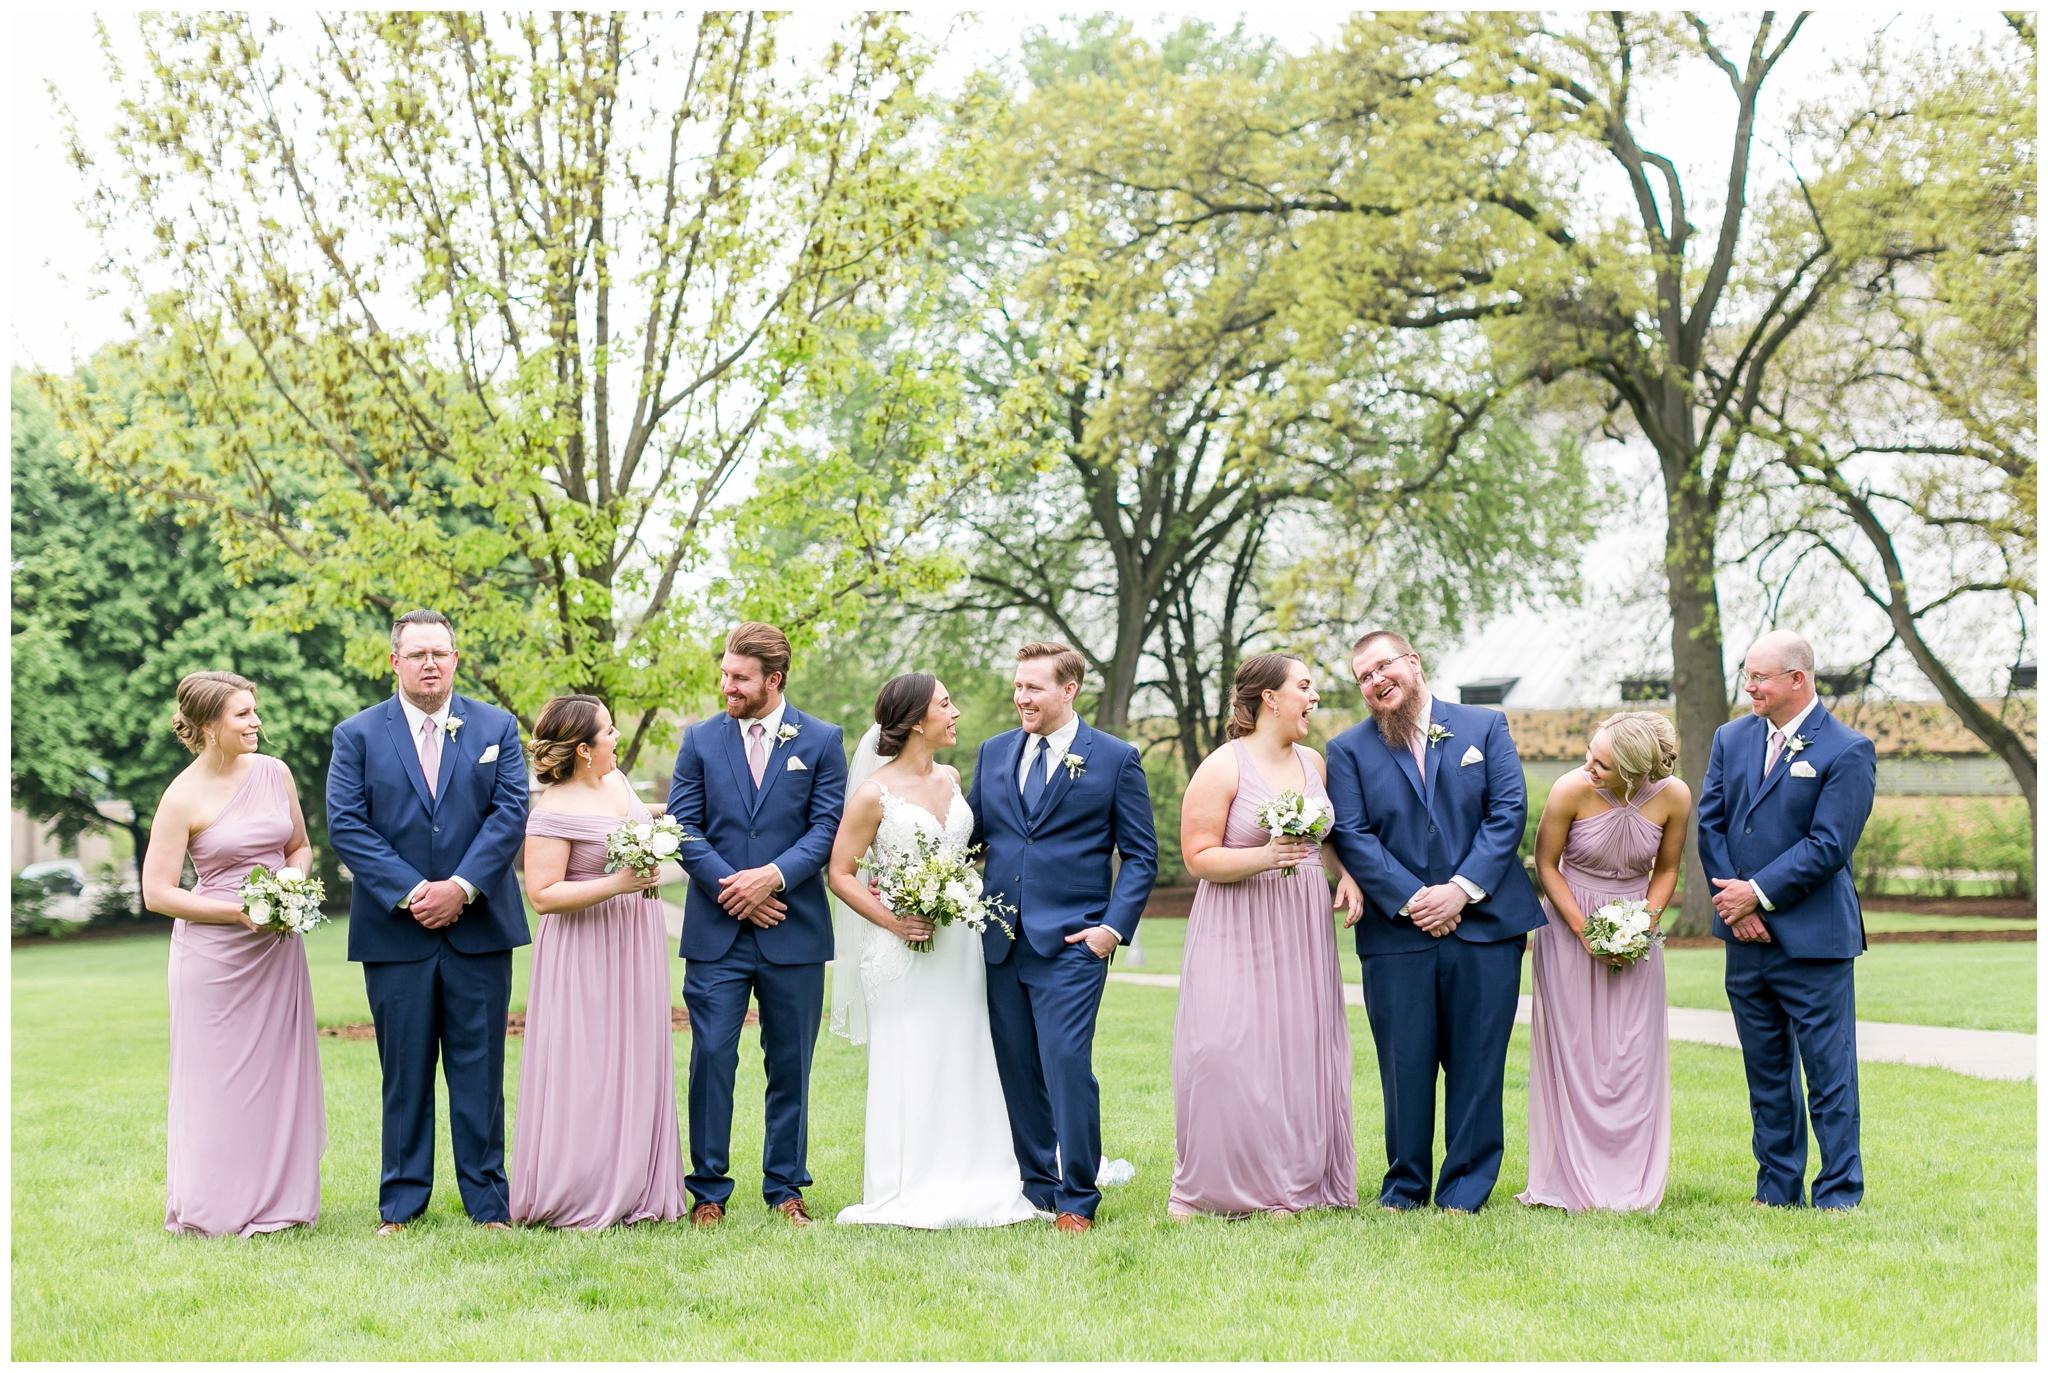 Union_south_Wedding_Madison_Wisconsin_Caynay_Photo_3664.jpg